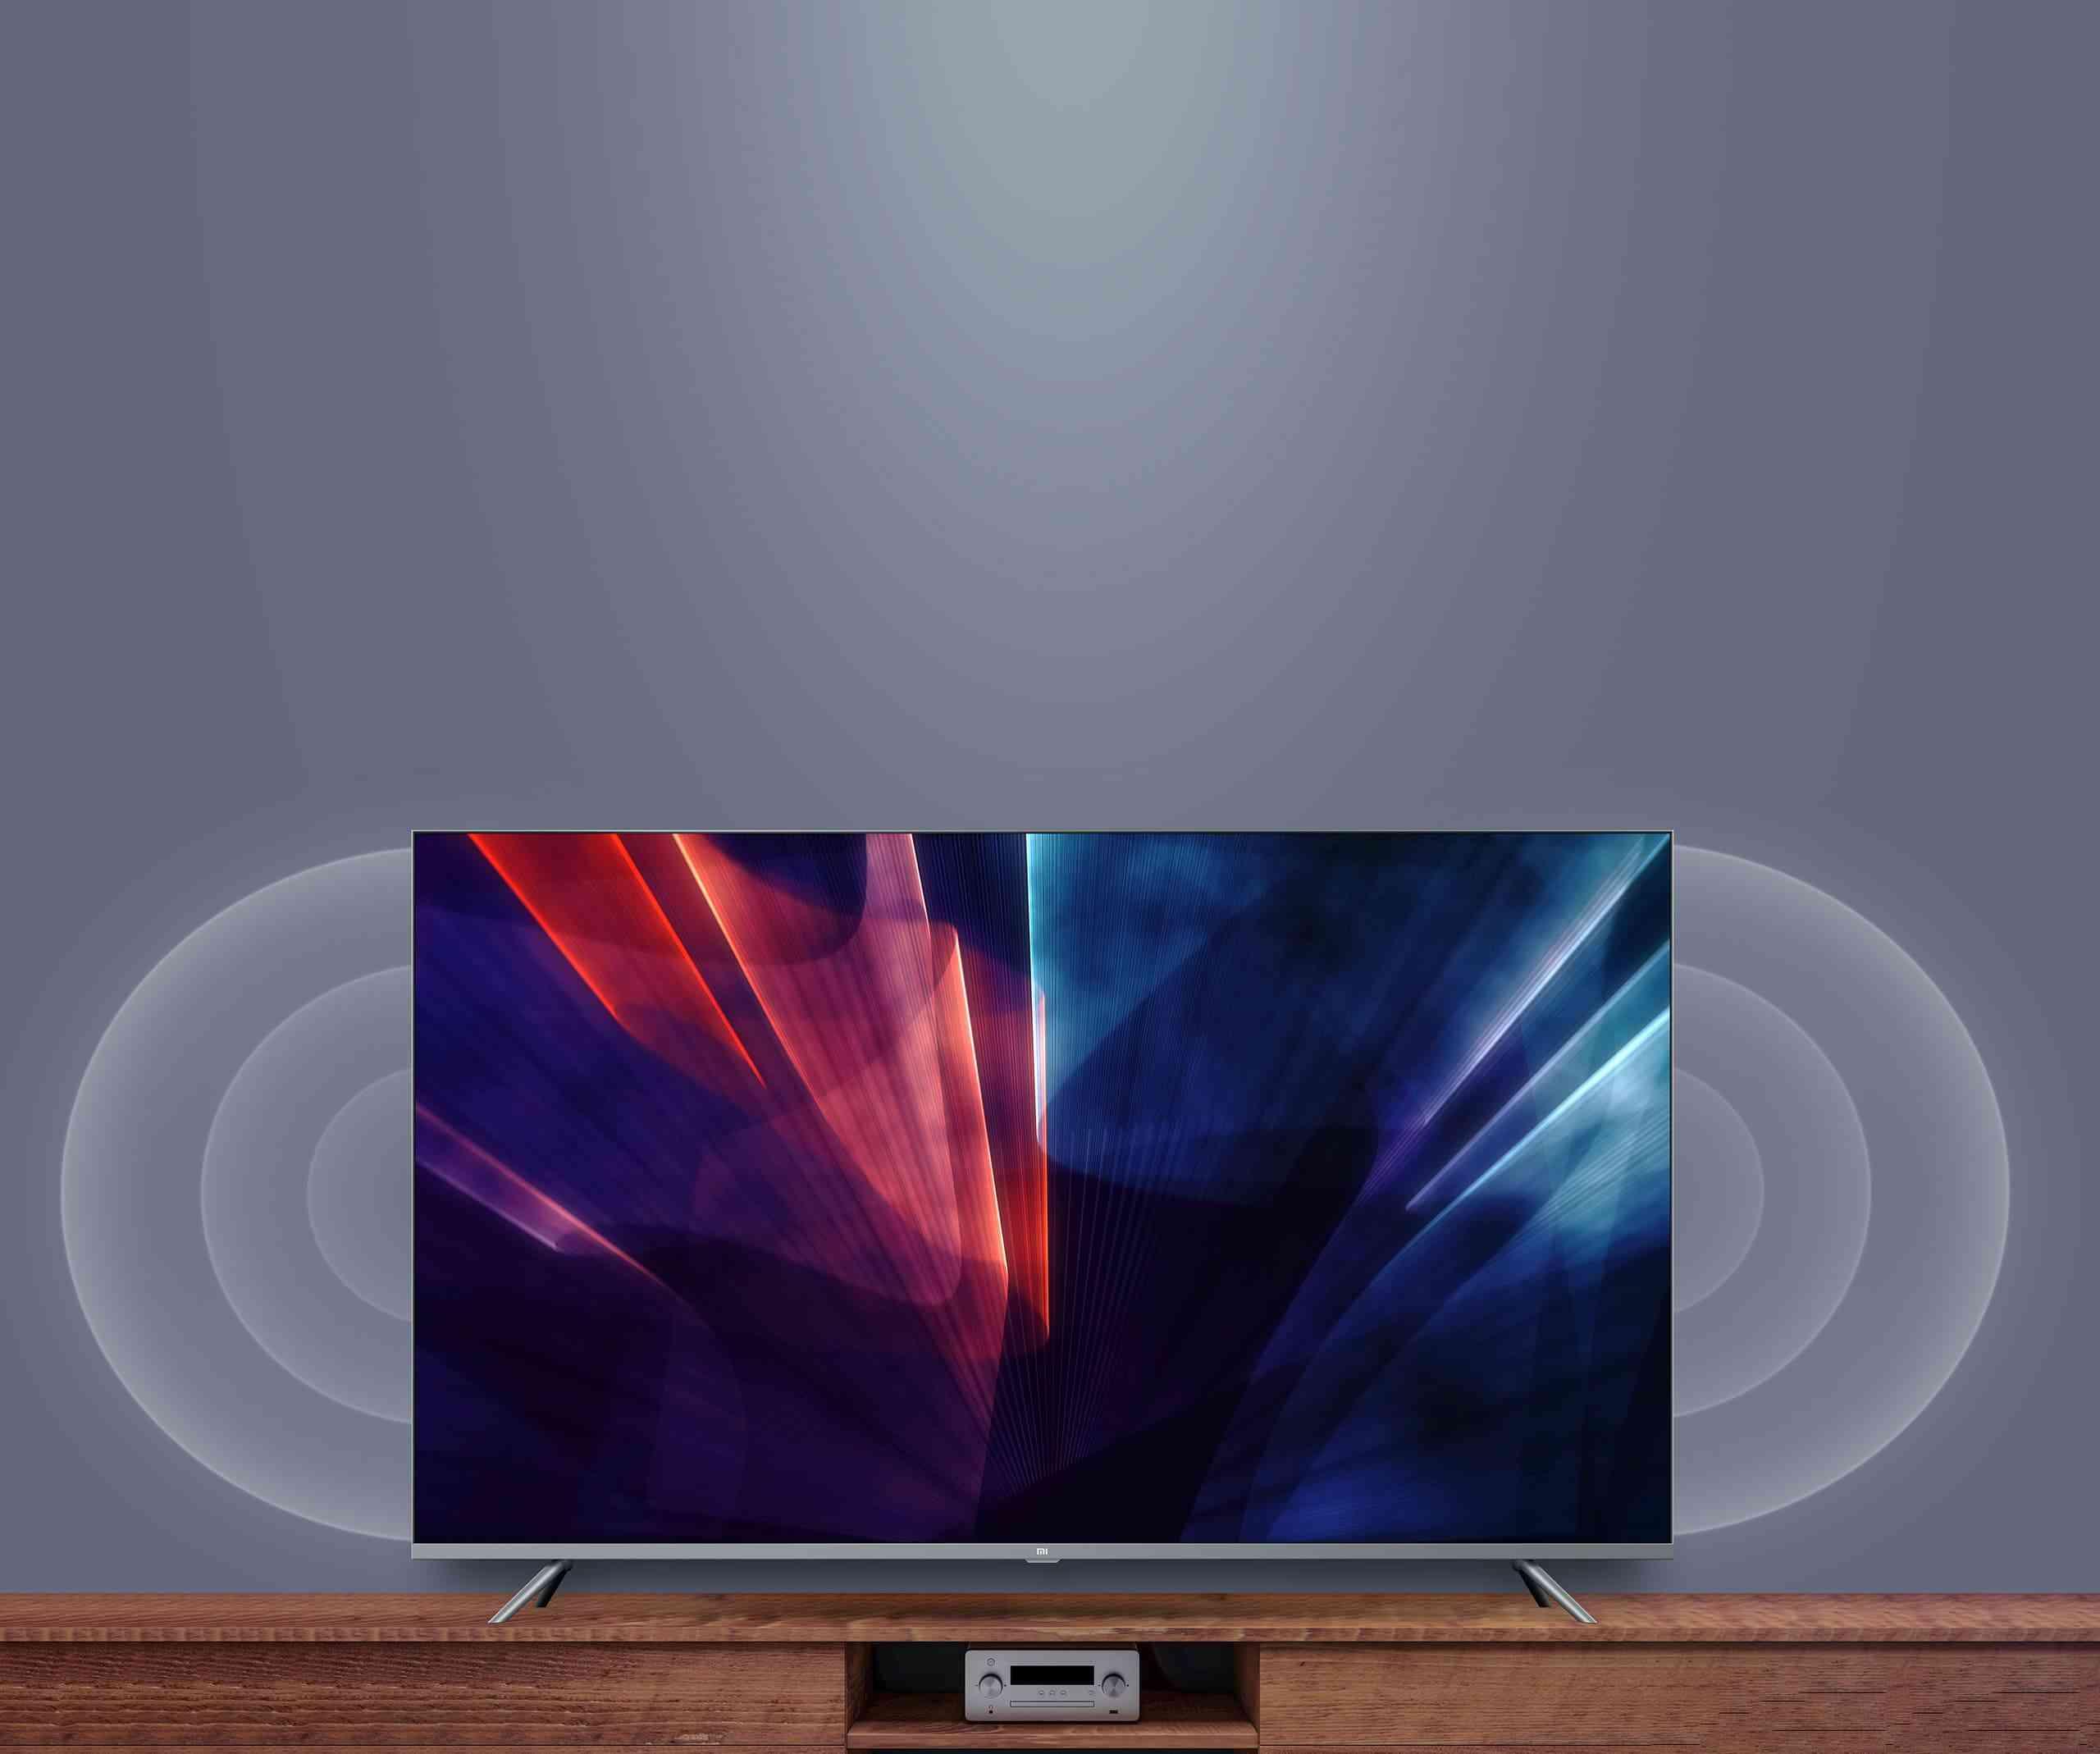 Mi Tv Audio Experience